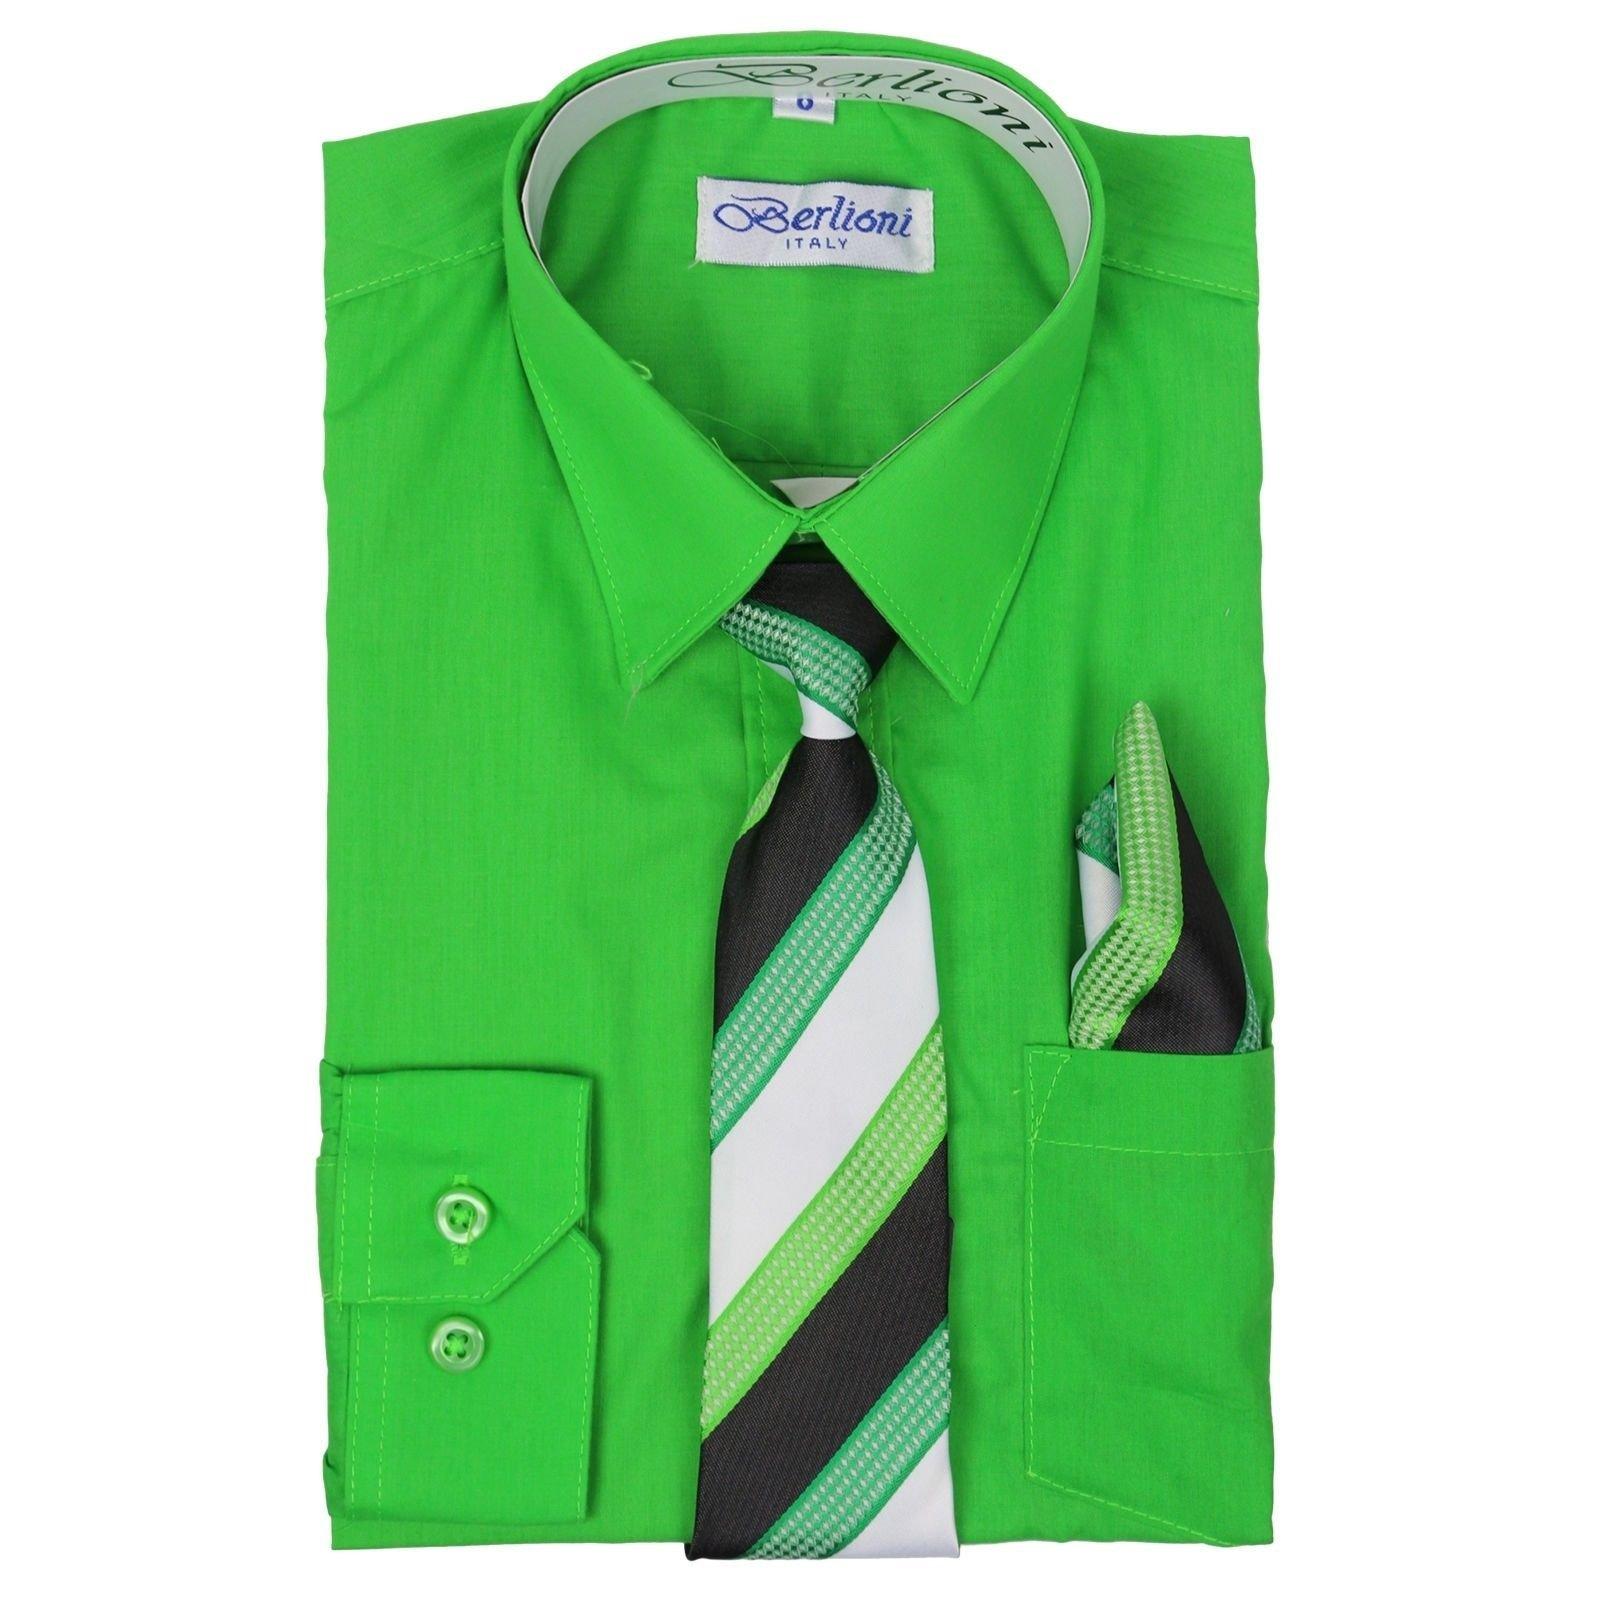 Berlioni Boys Italian Long Sleeve Dress Shirt with Tie & Hanky-Apple Green-4